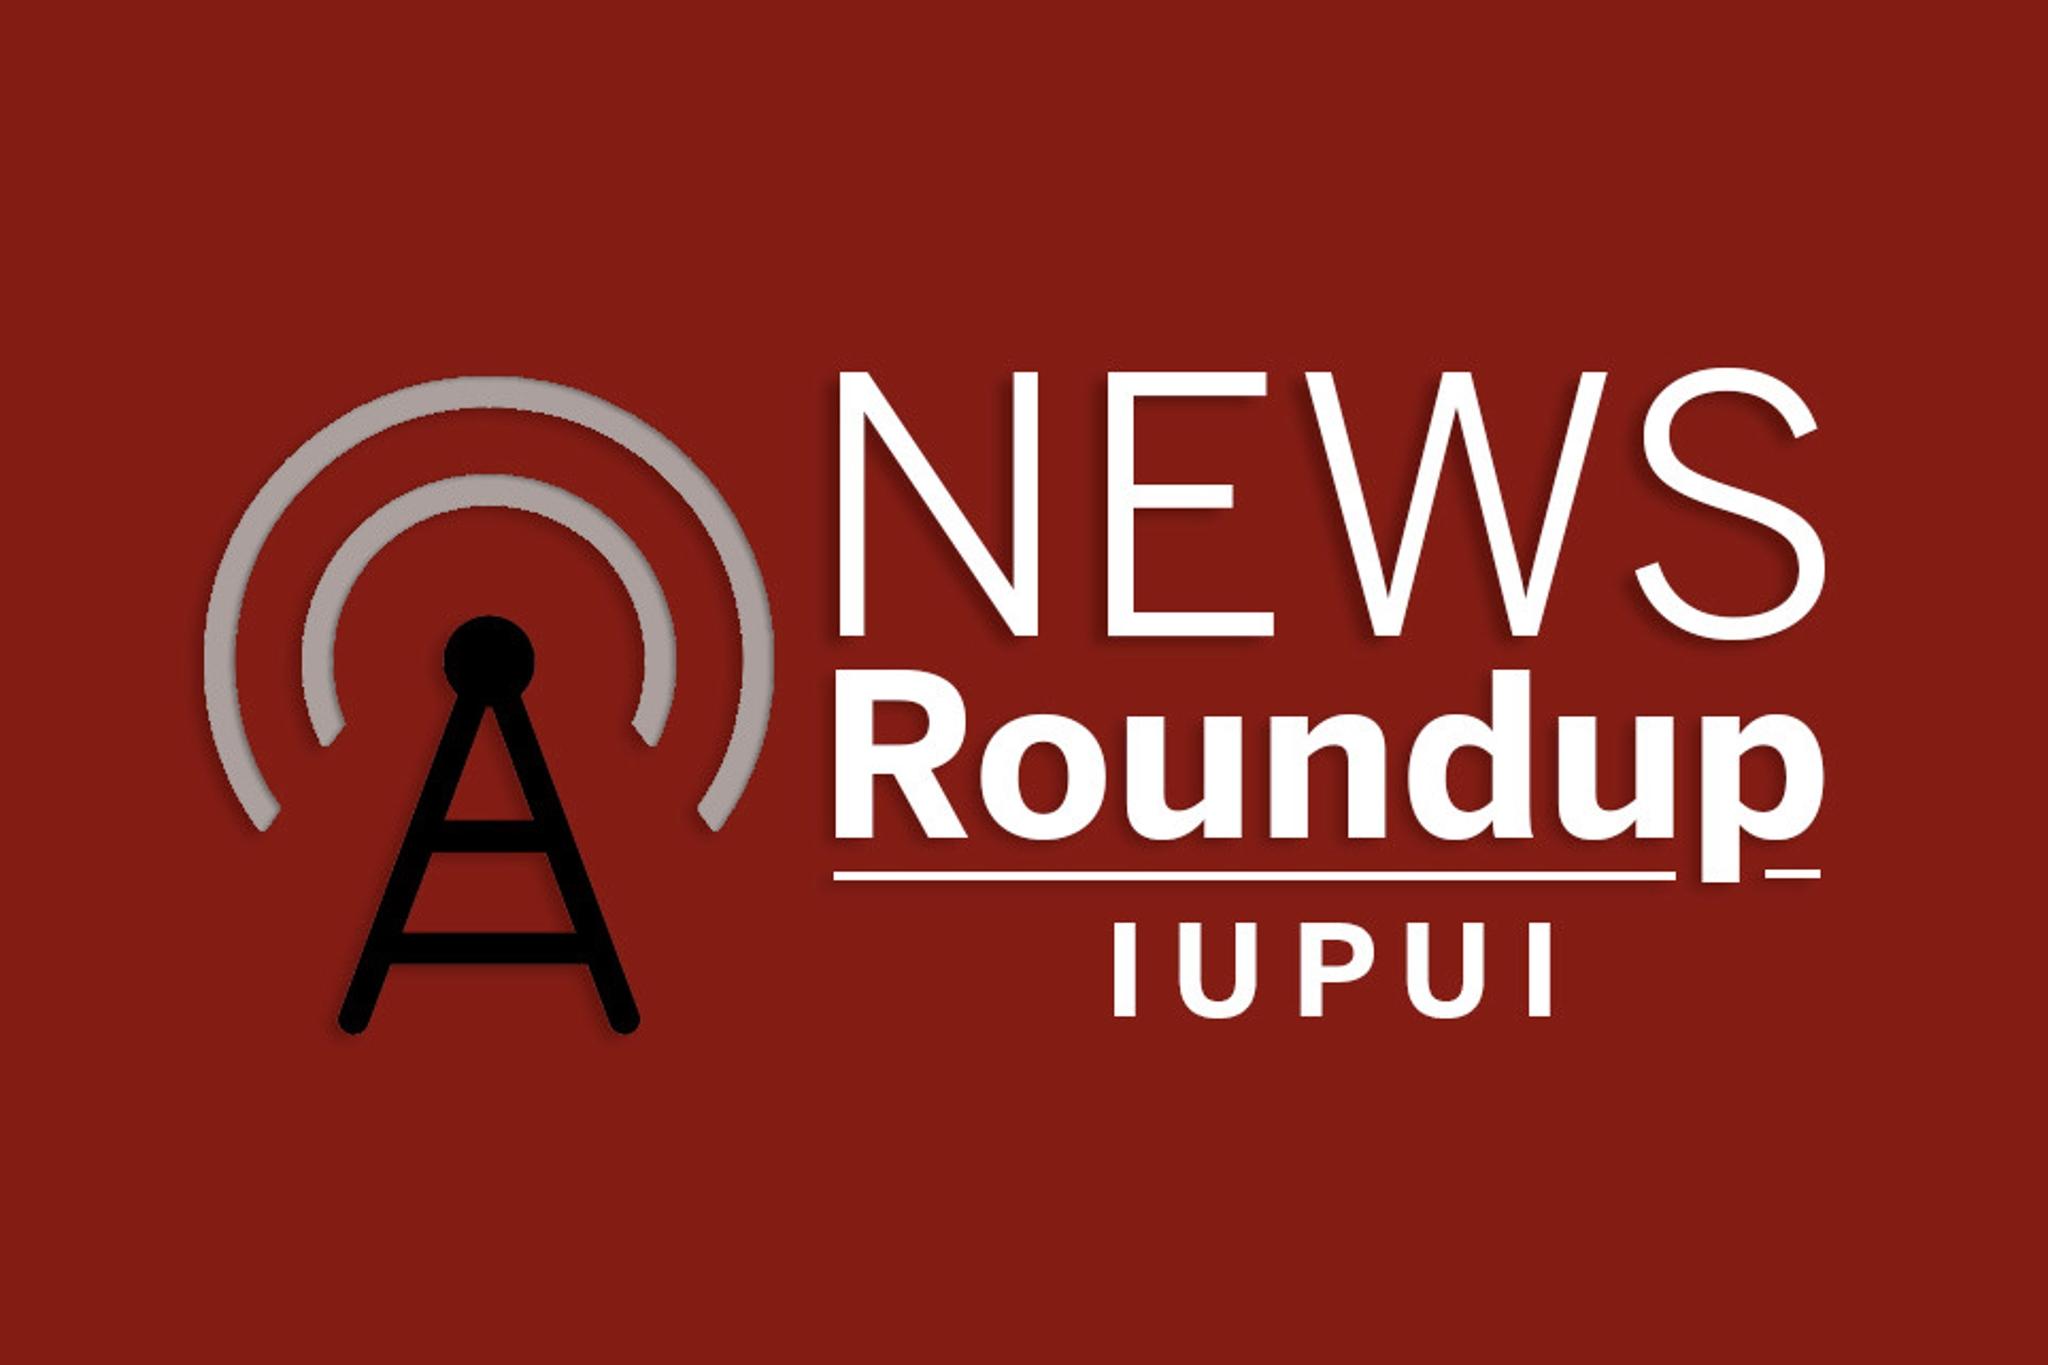 Iu Academic Calendar Spring 2022.Around Iupui News At Iu Indiana University